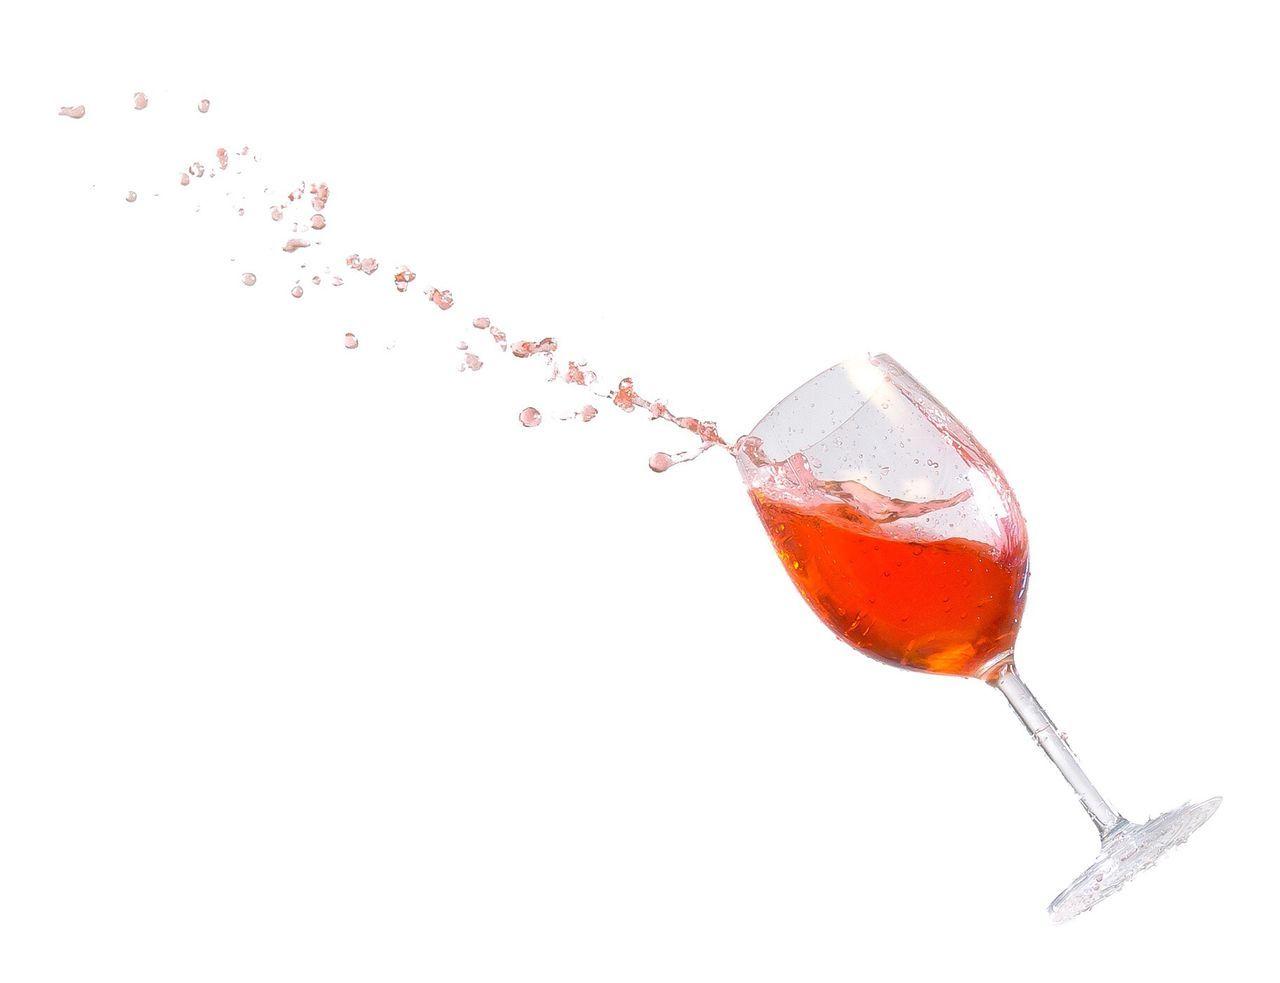 Splash Wineglass Splash Highspeedphotography Stopactionphotographer